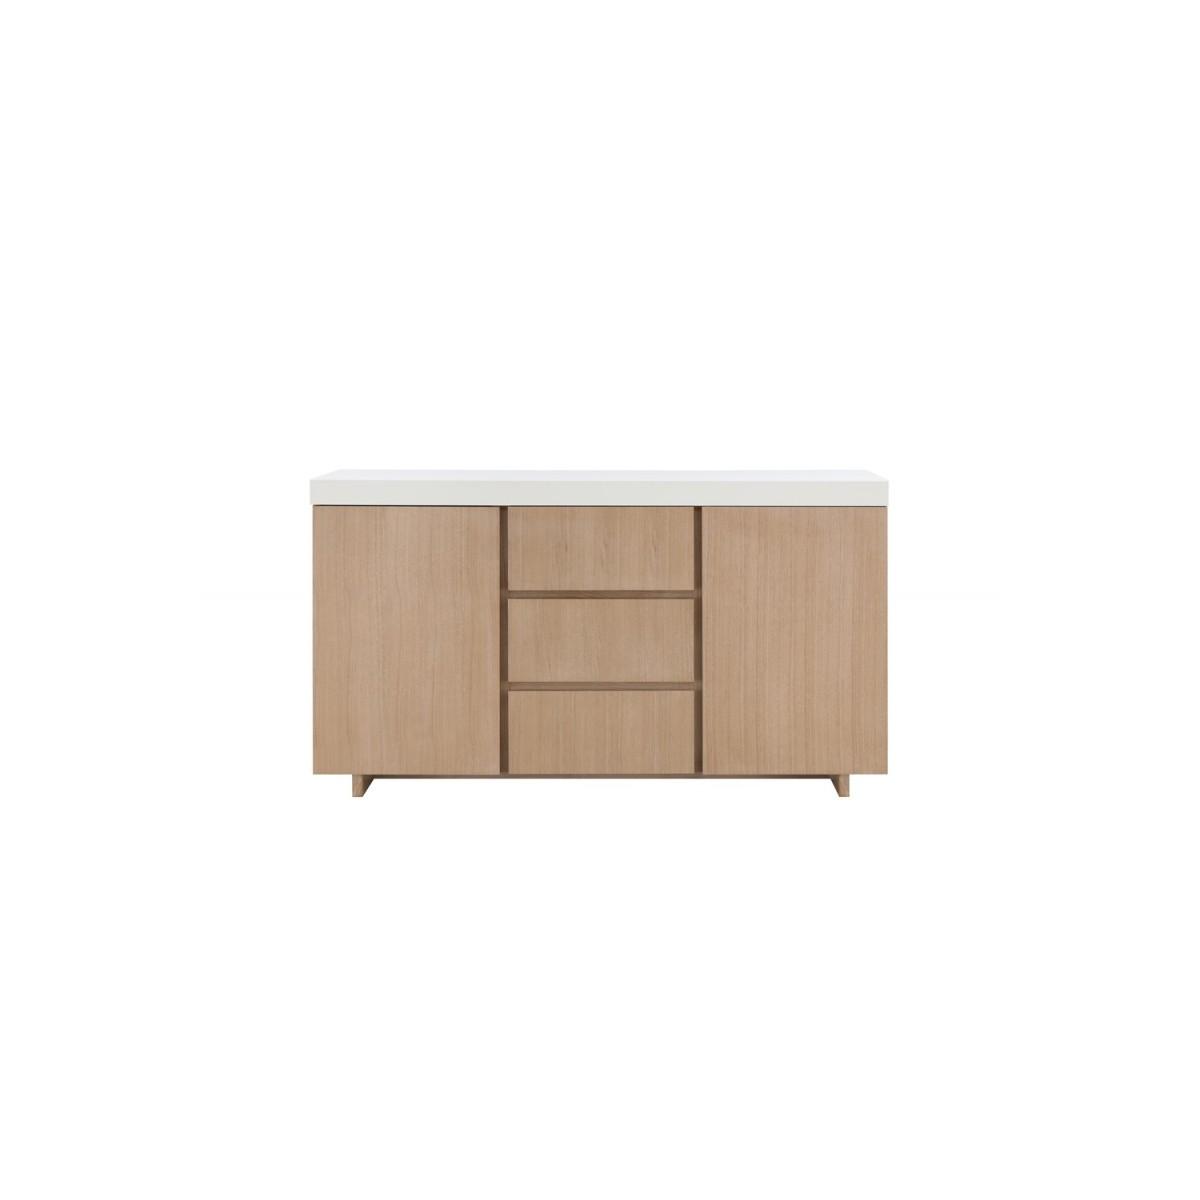 buffet enfilade 2 portes 3 tiroirs design et scandinave emma en bois chene clair blanc amp story 5483